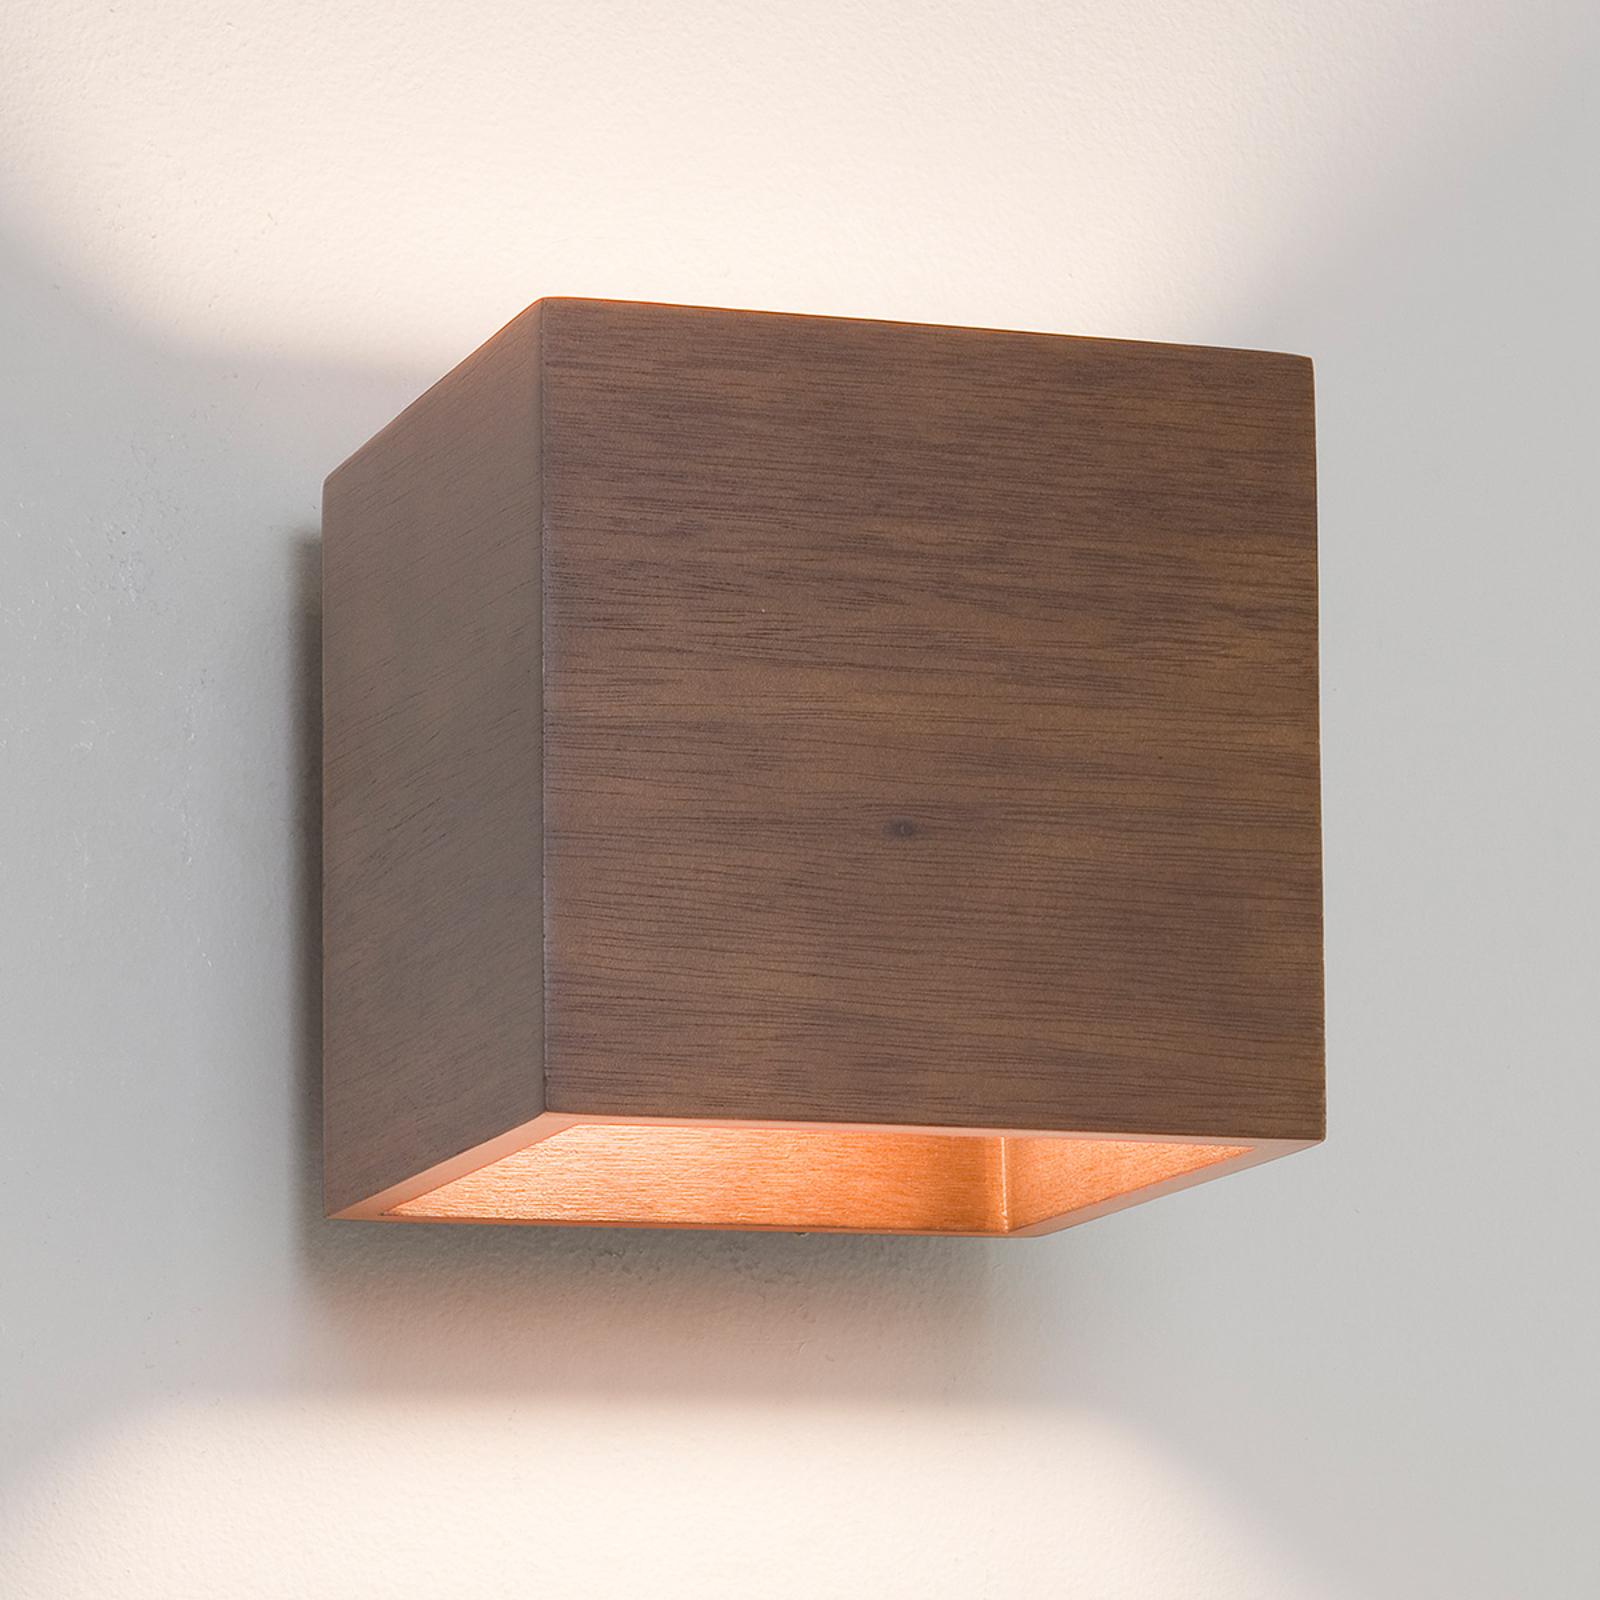 Piękna lampa ścienna CREMONA drewno